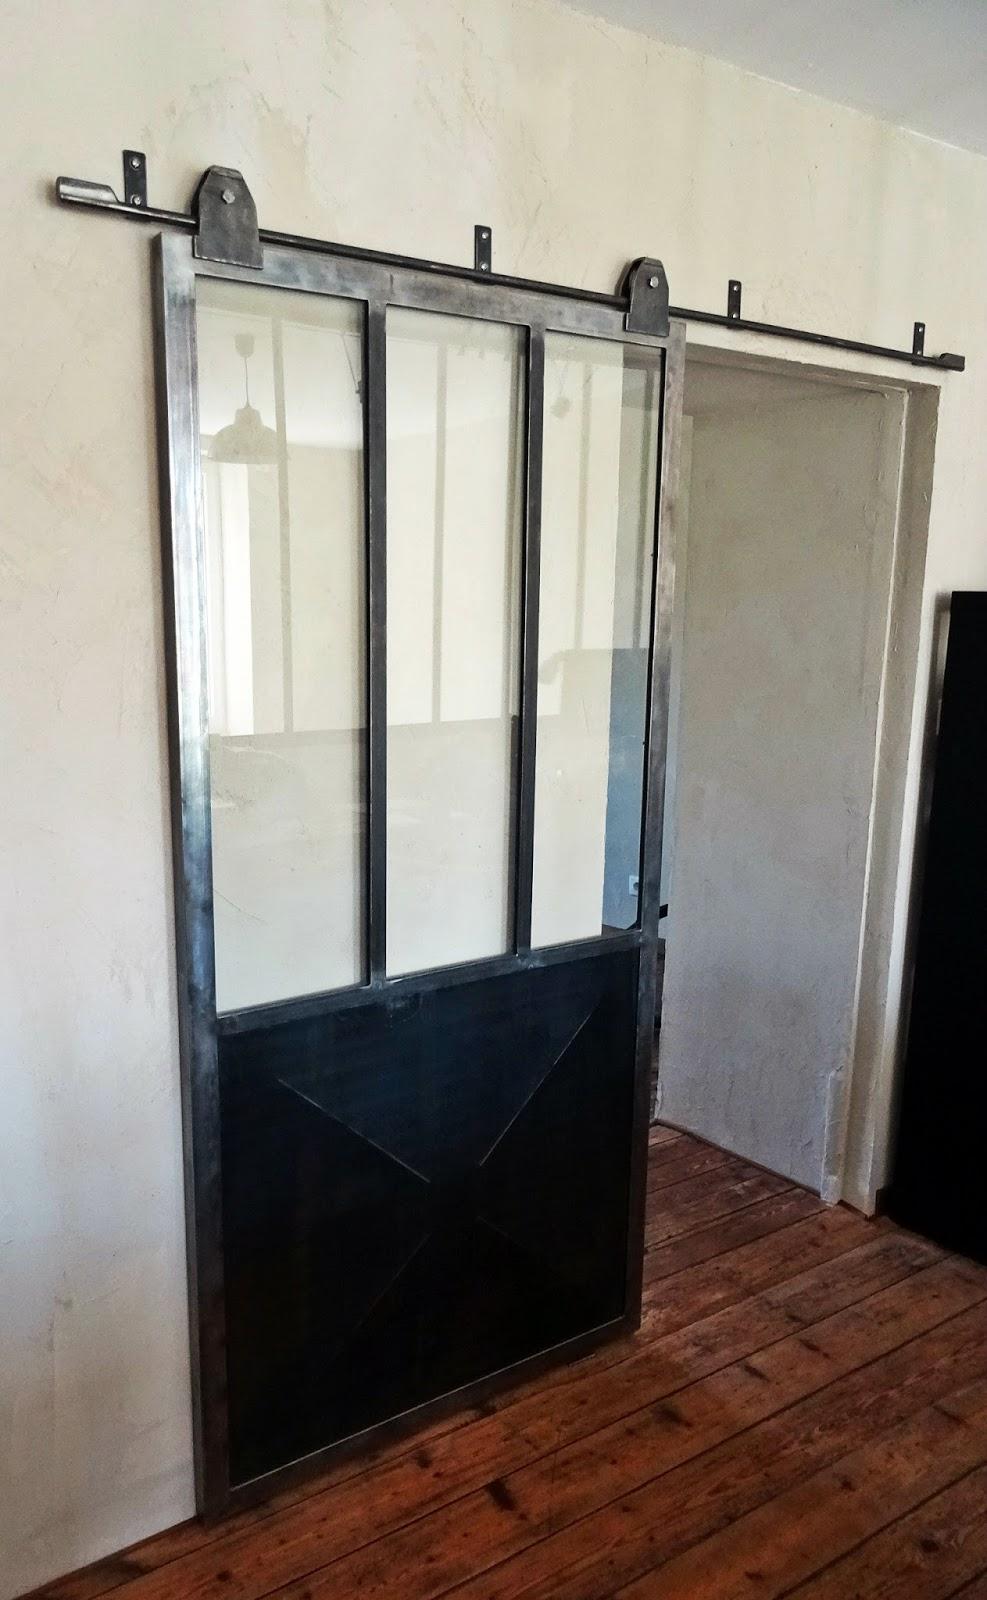 ferronnerie m tallerie serrurerie 79 deux s vres l 39 art du fer play verri re et porte. Black Bedroom Furniture Sets. Home Design Ideas